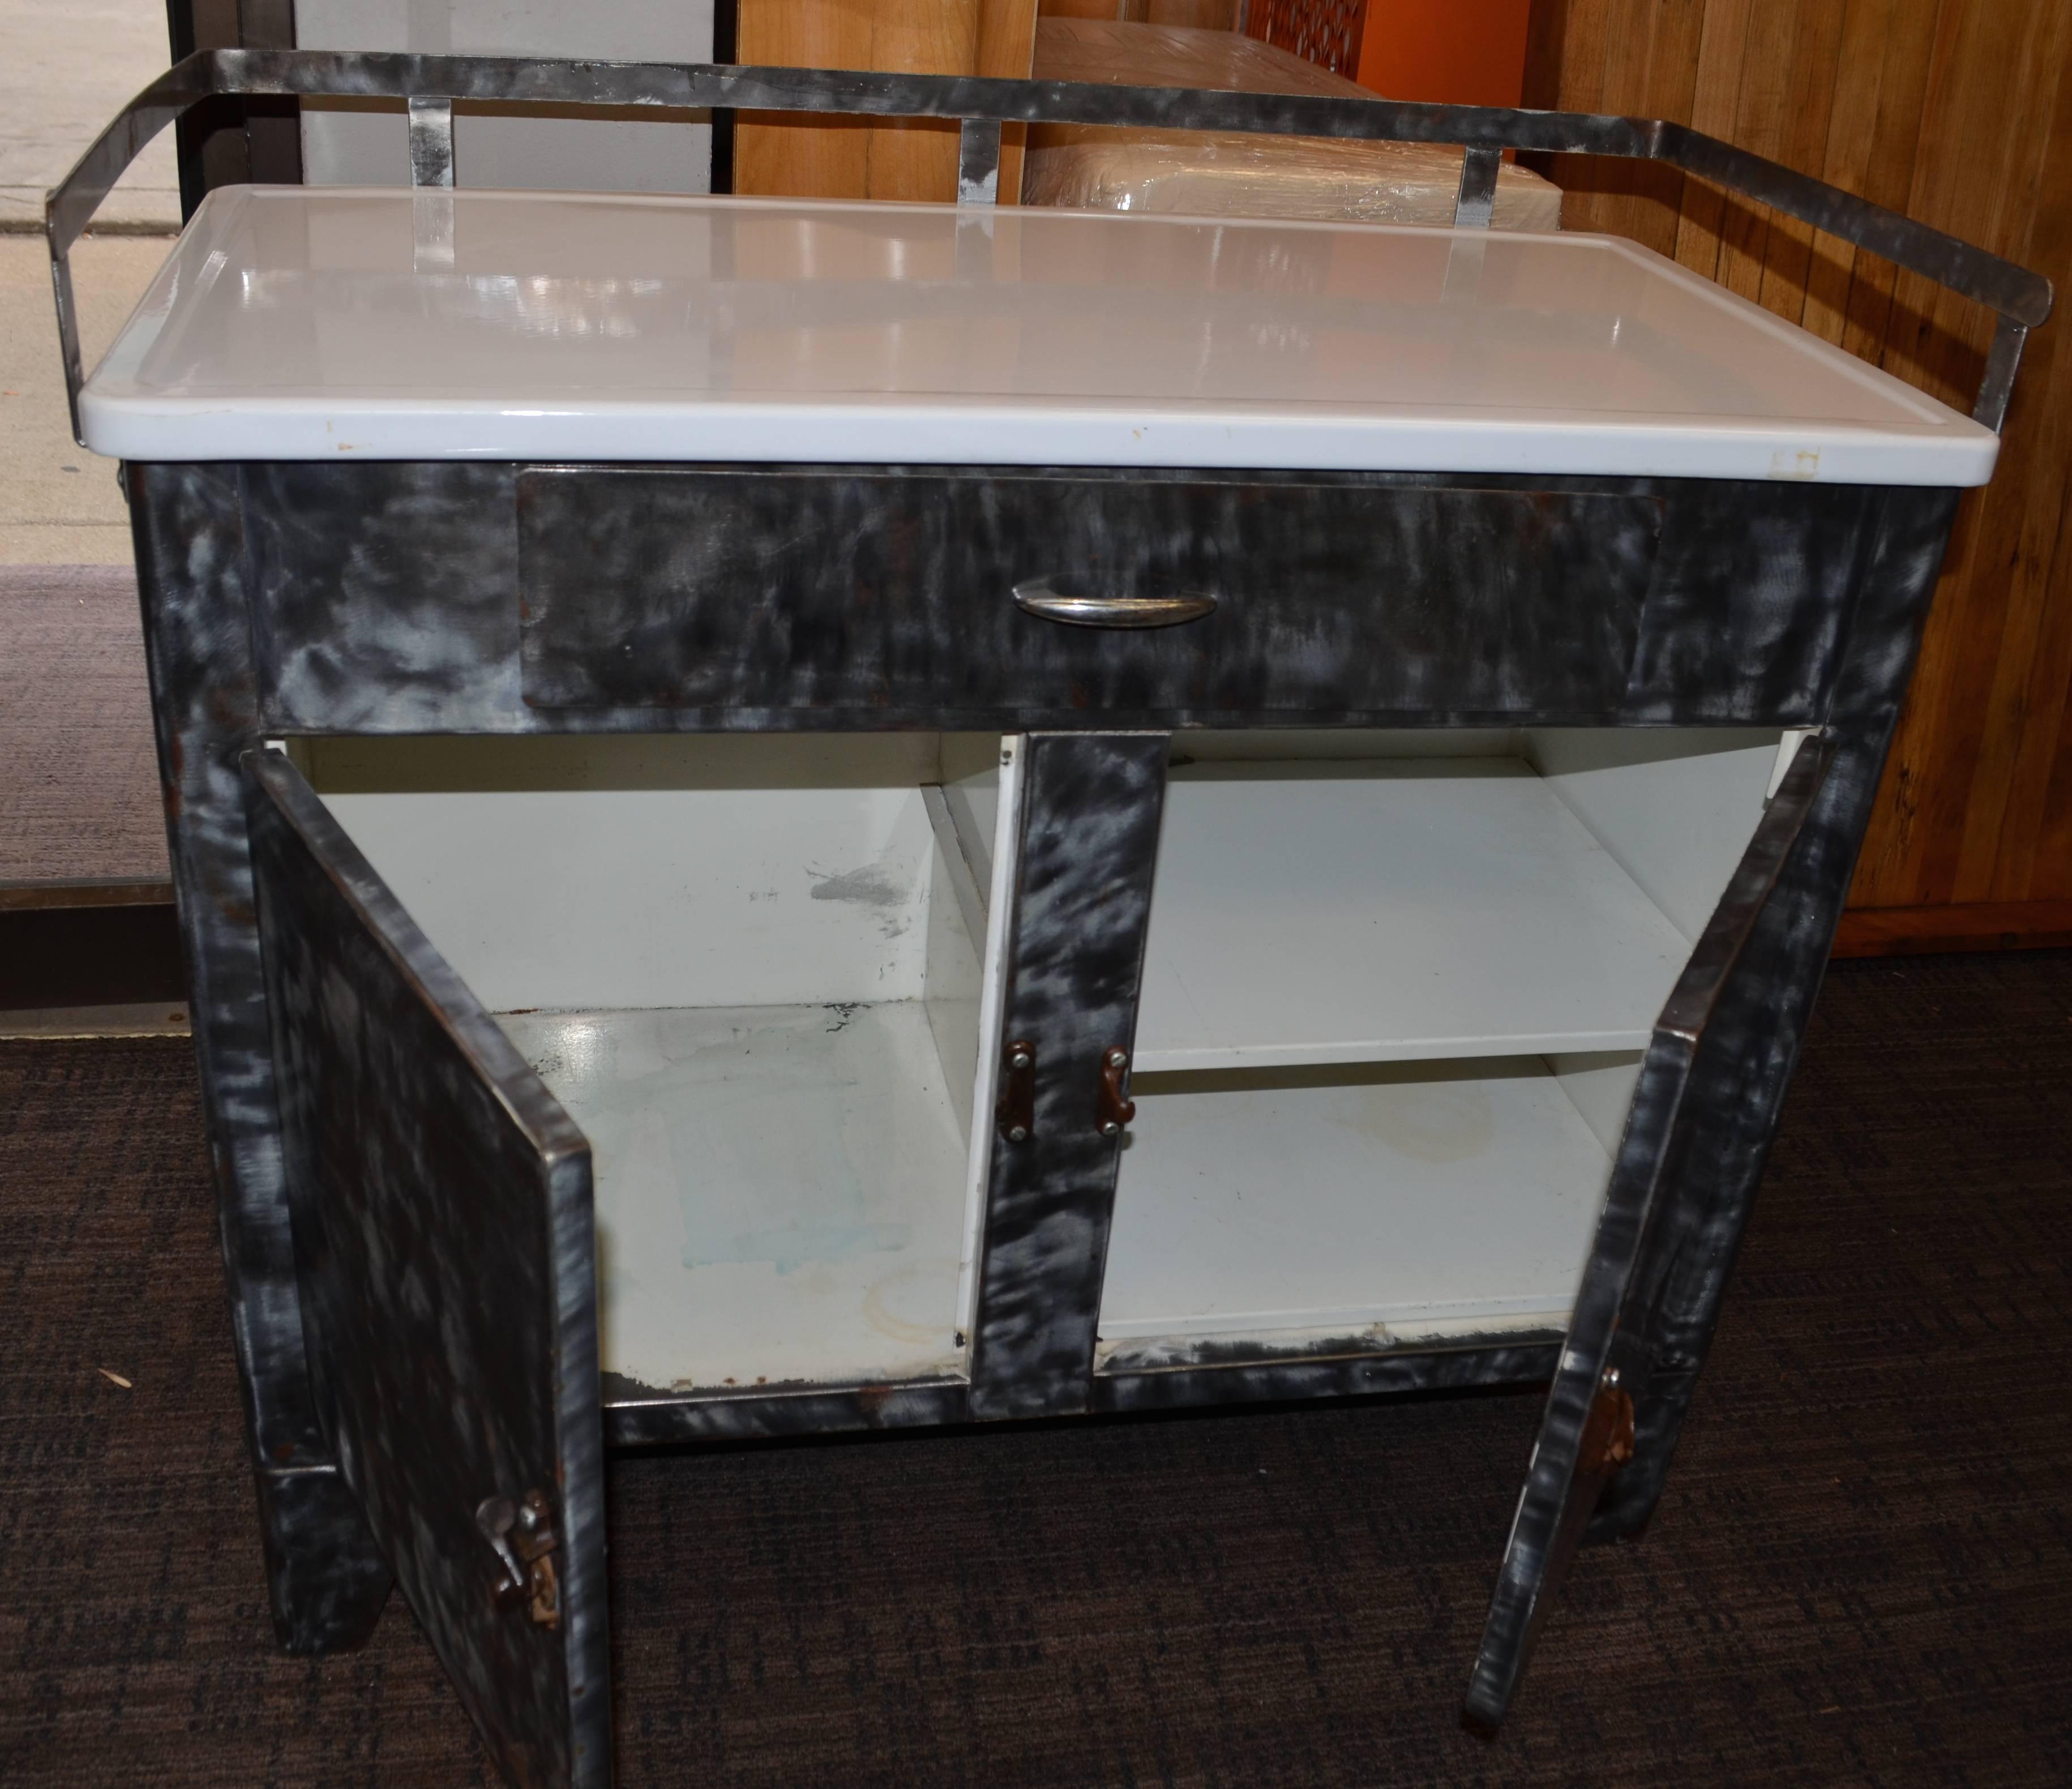 Cabinet With Porcelain Top For Kitchen, Bath, Hallway, Entertainment Center  For Sale 2